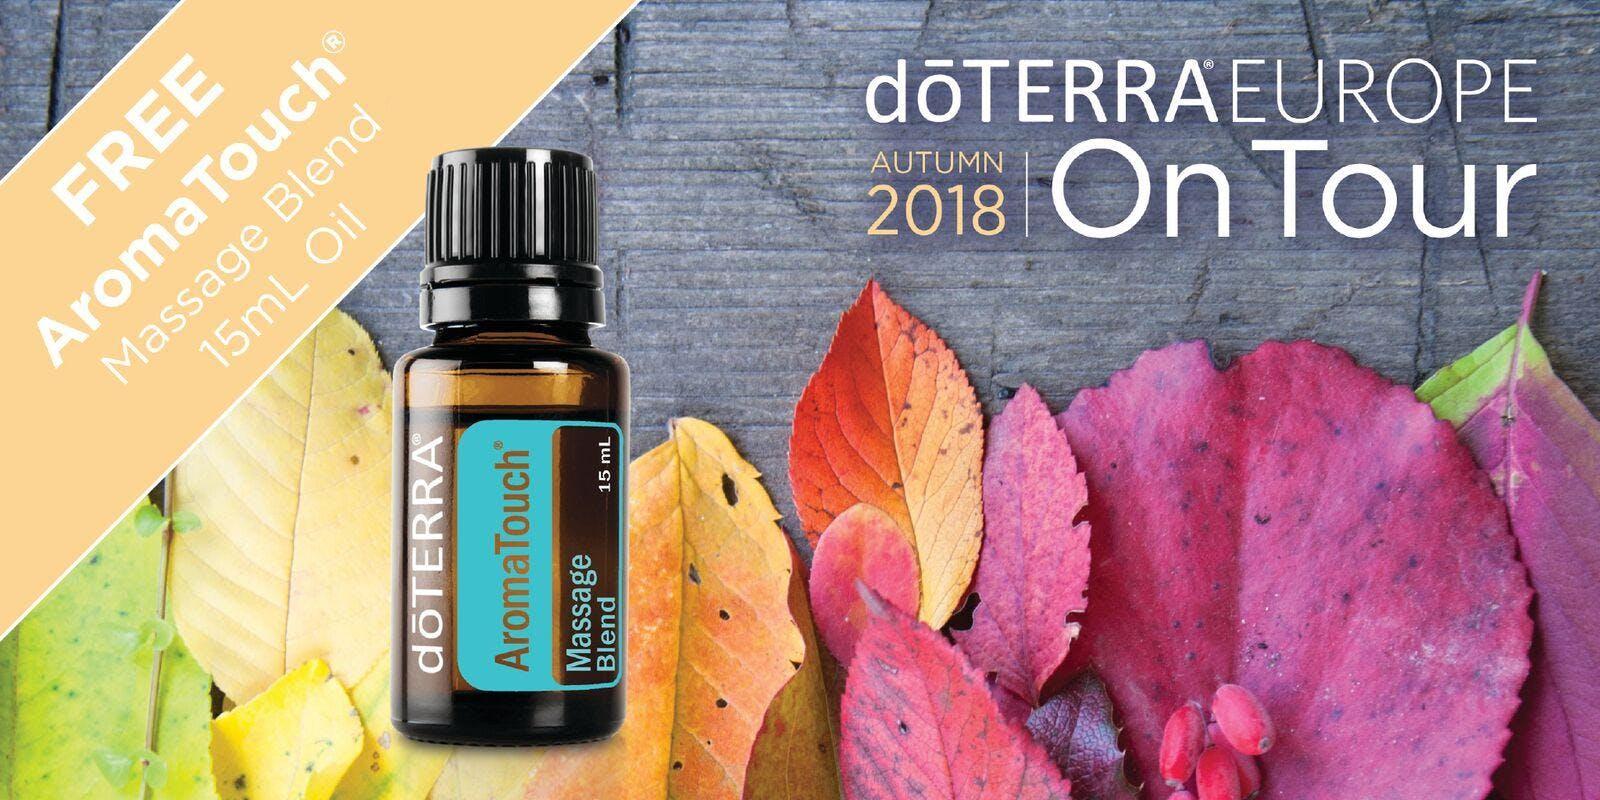 dōTERRA Autumn Tour 2018 - Lisbon